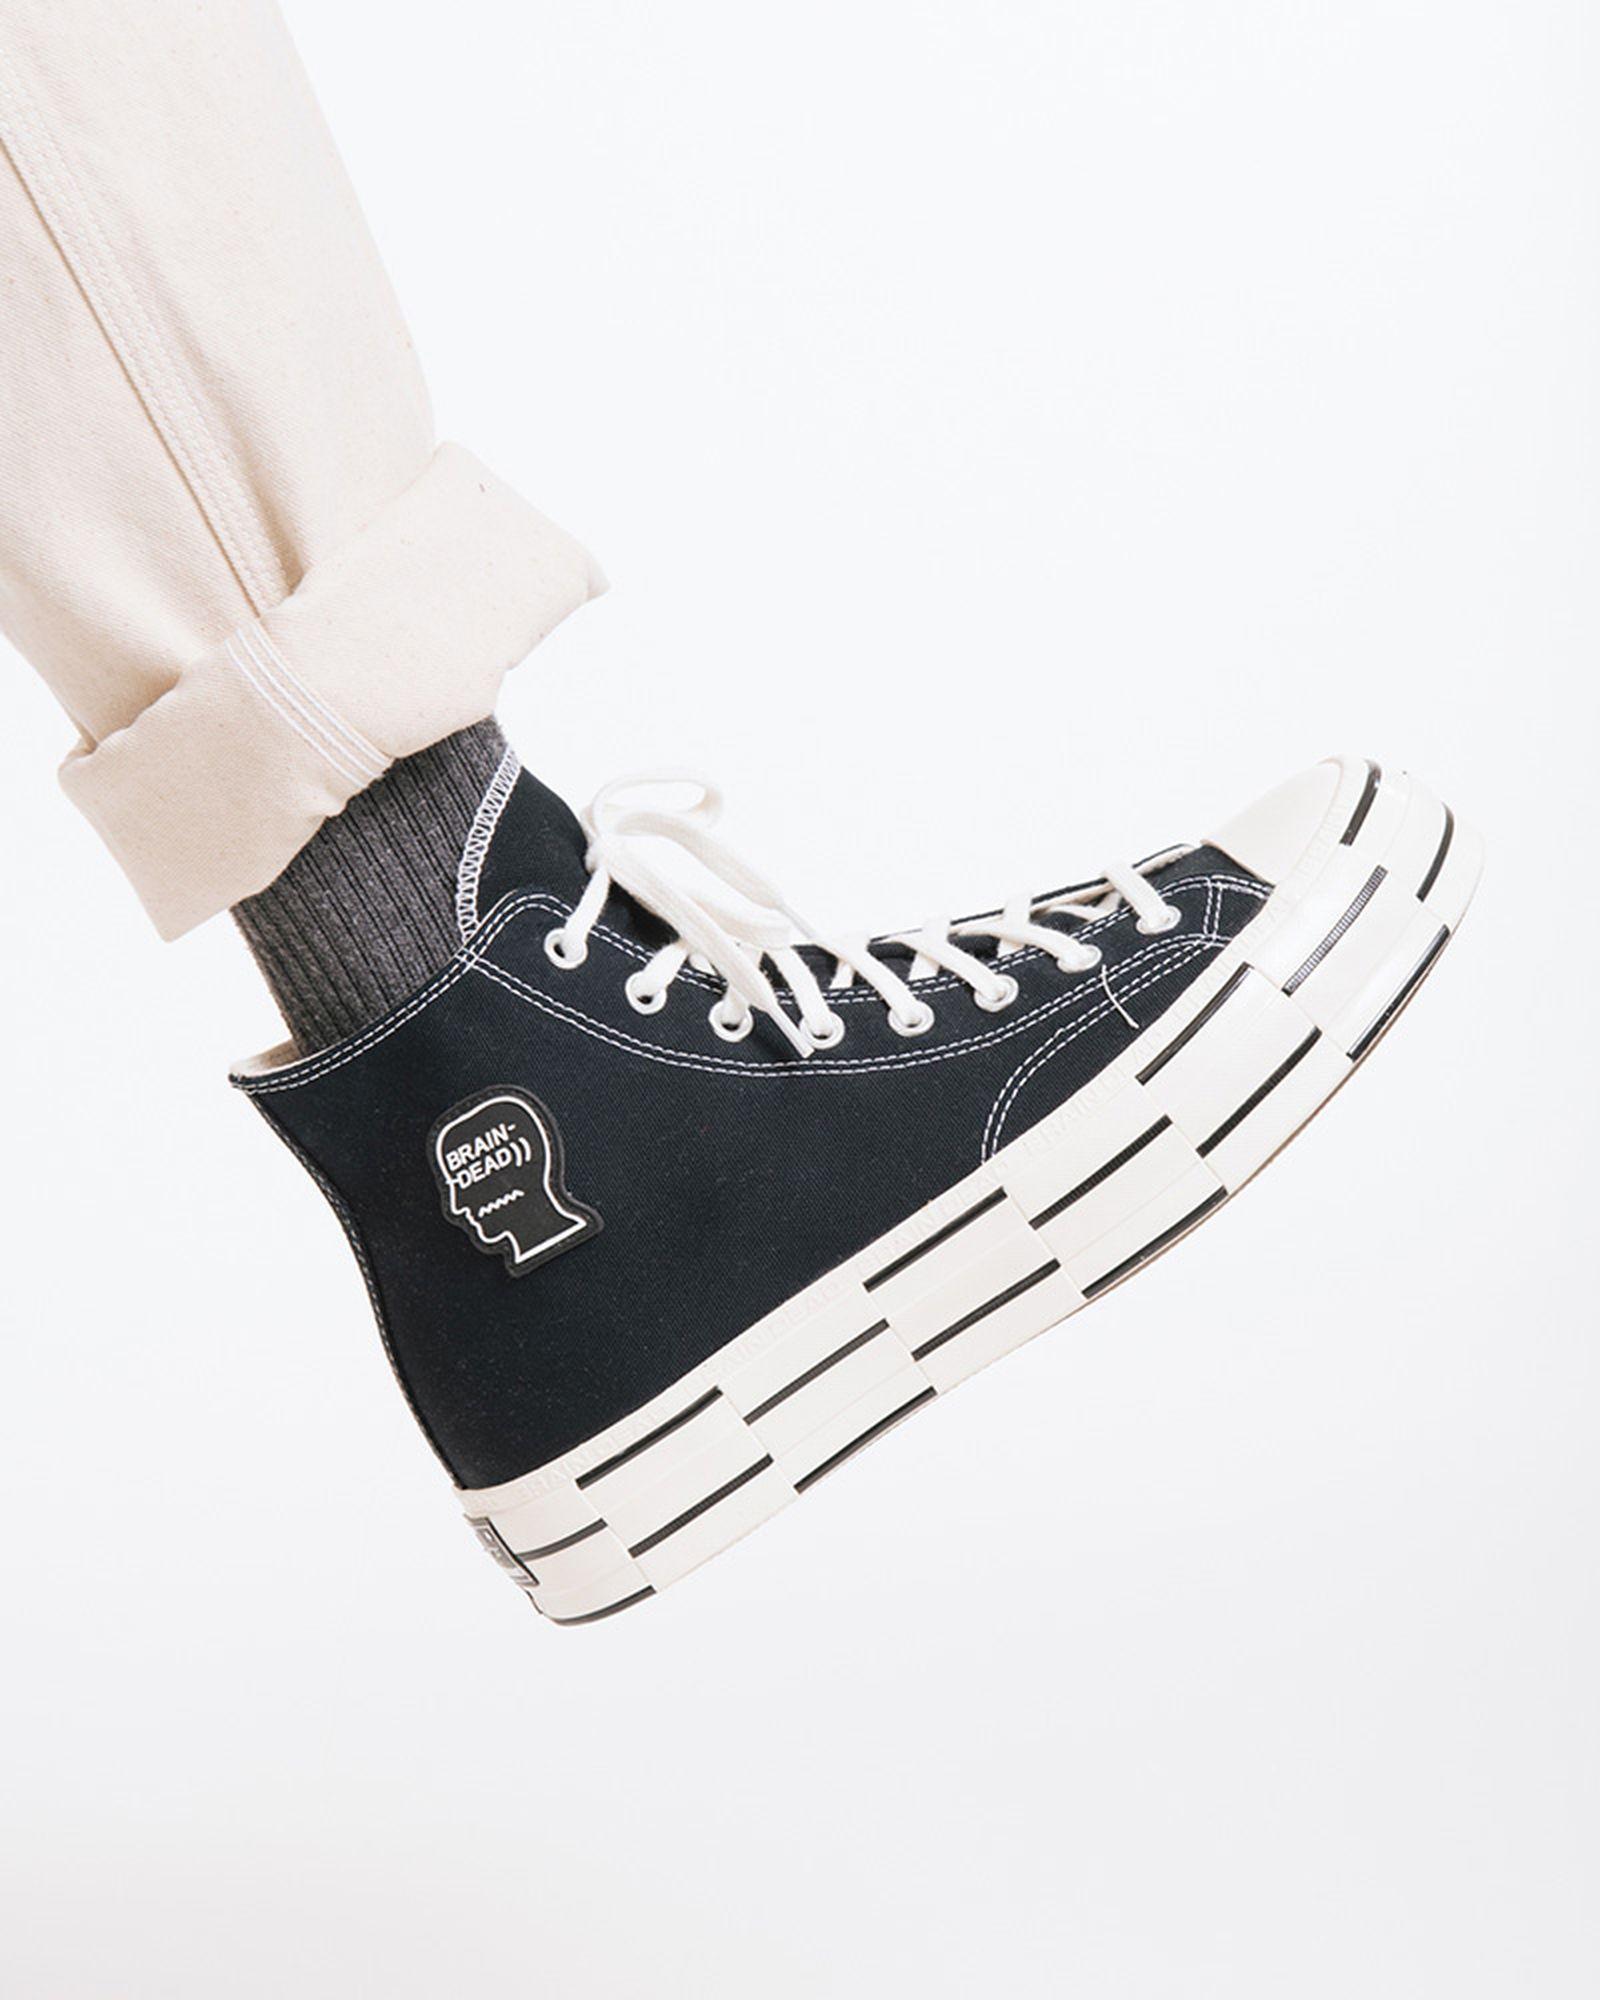 braindead-converse-chuck-taylor-fw20-release-date-price-06